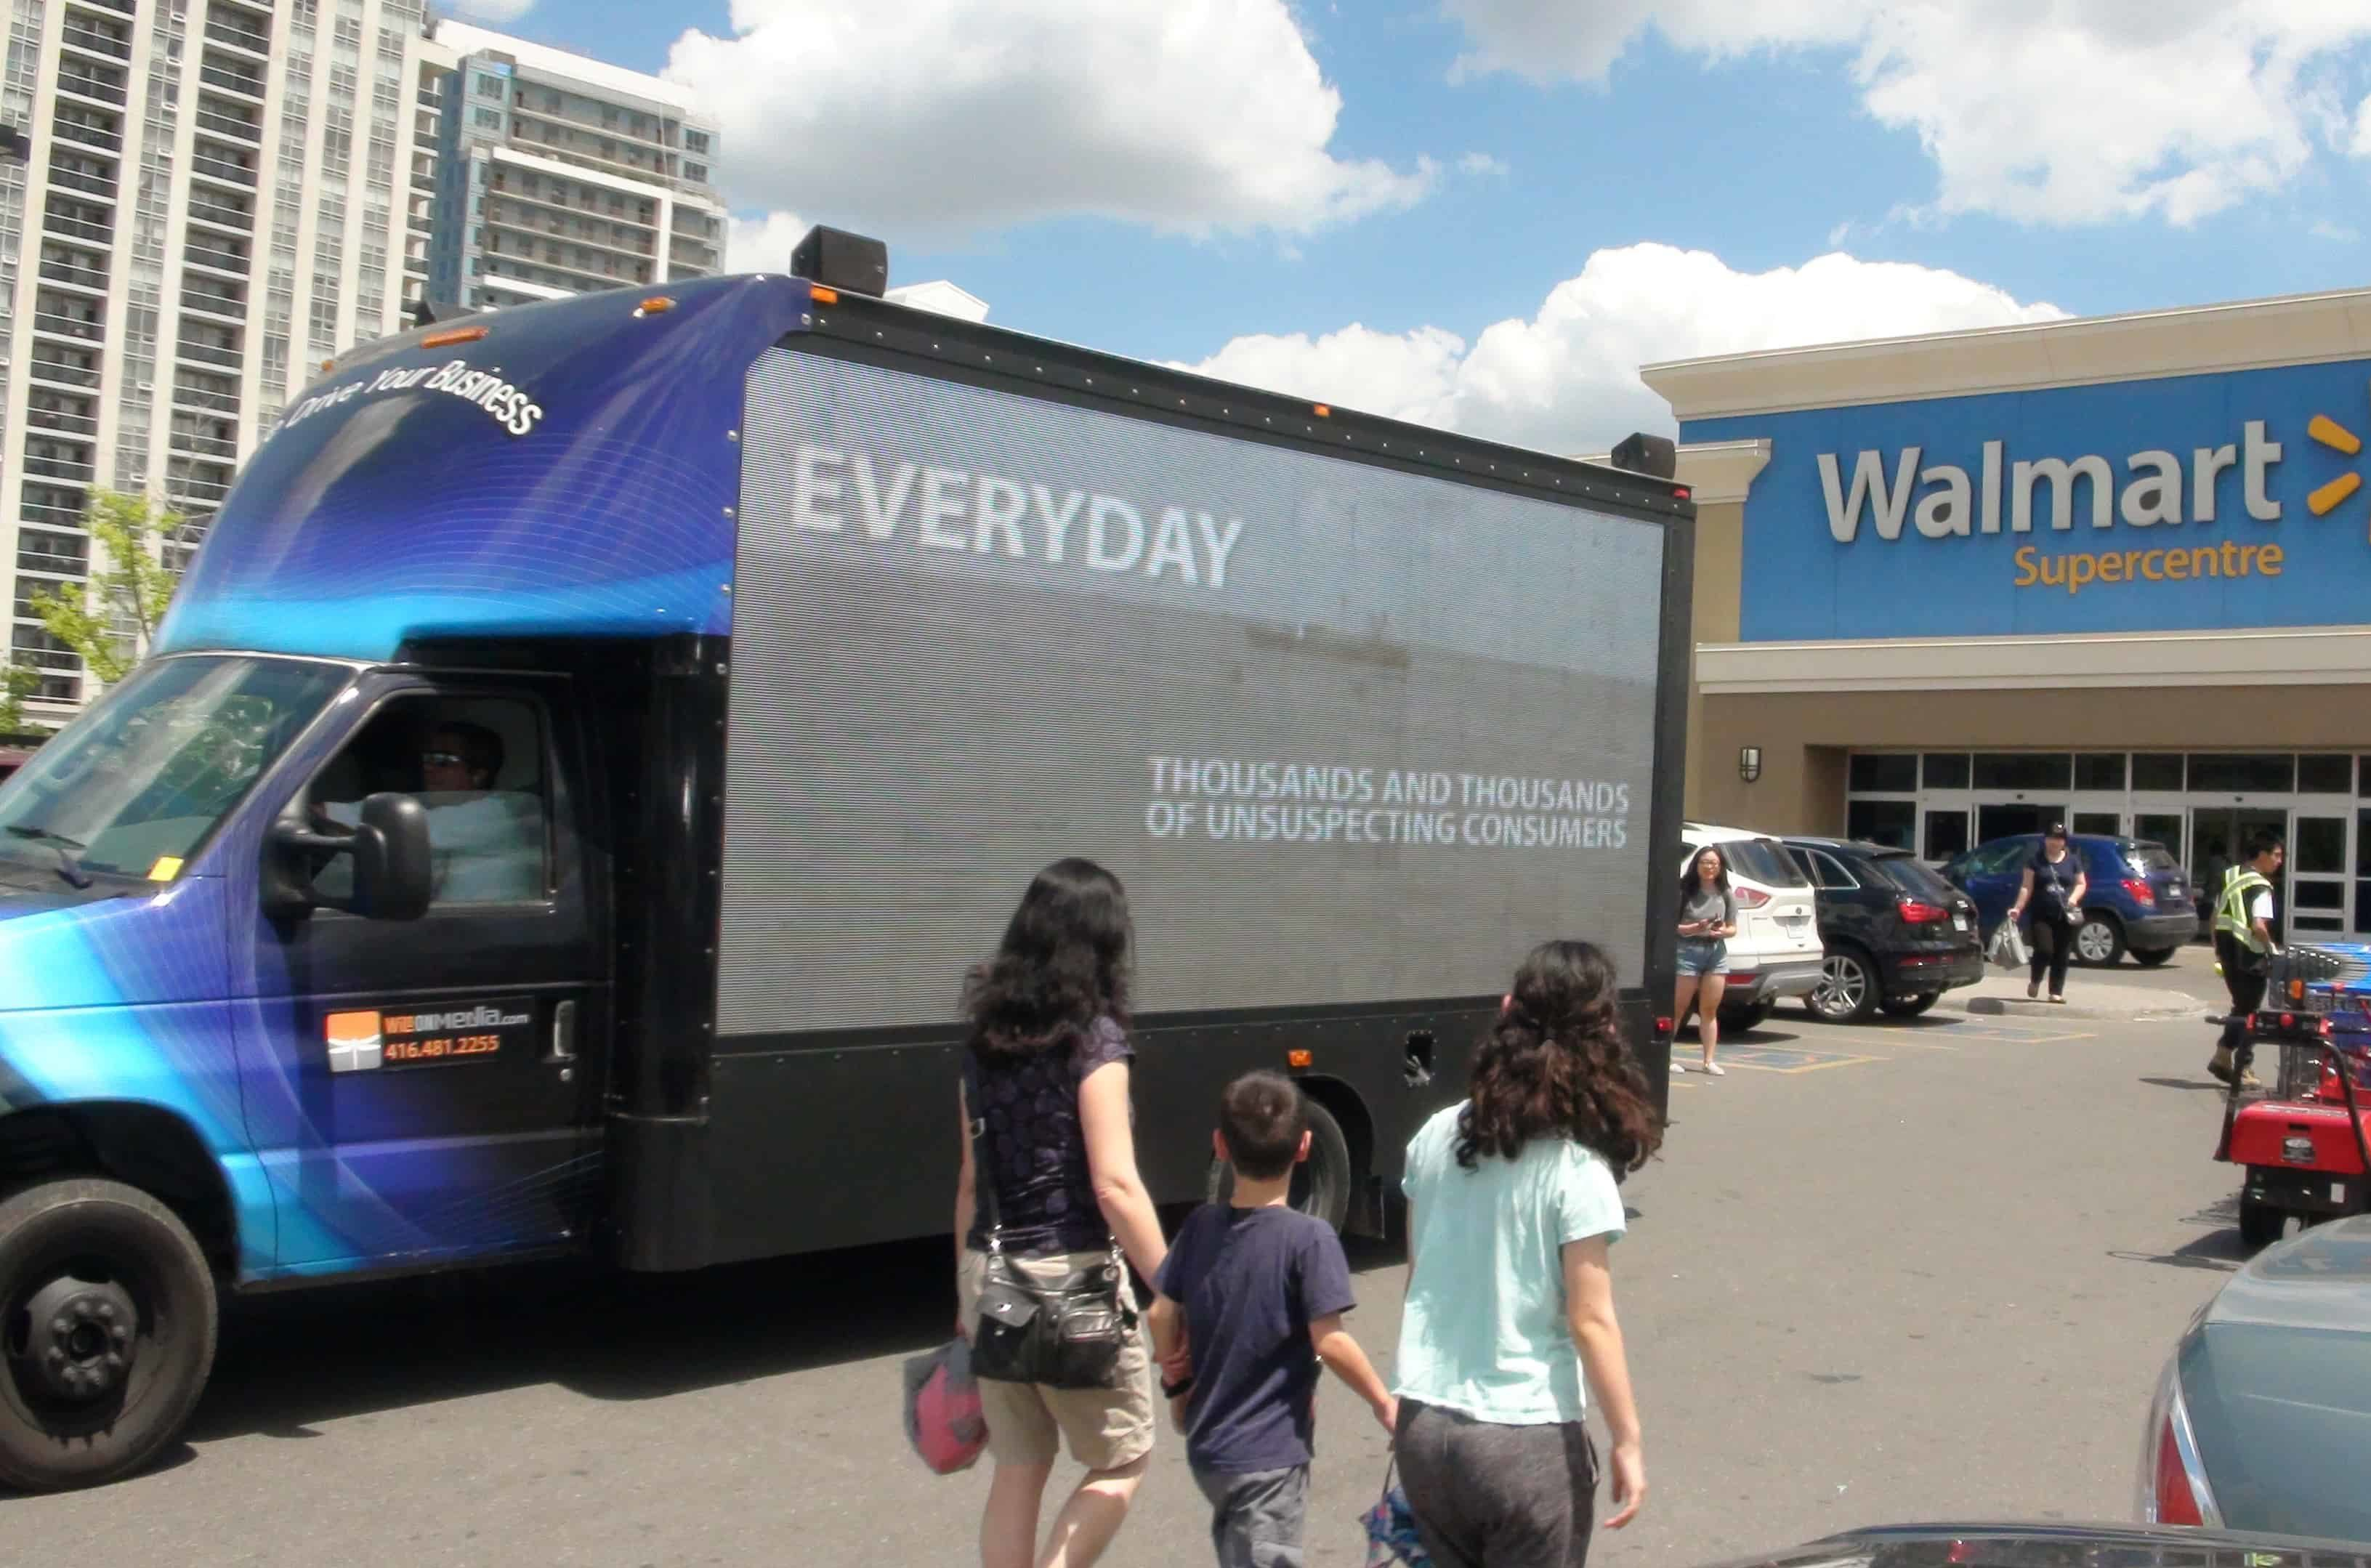 Truck advertising agency